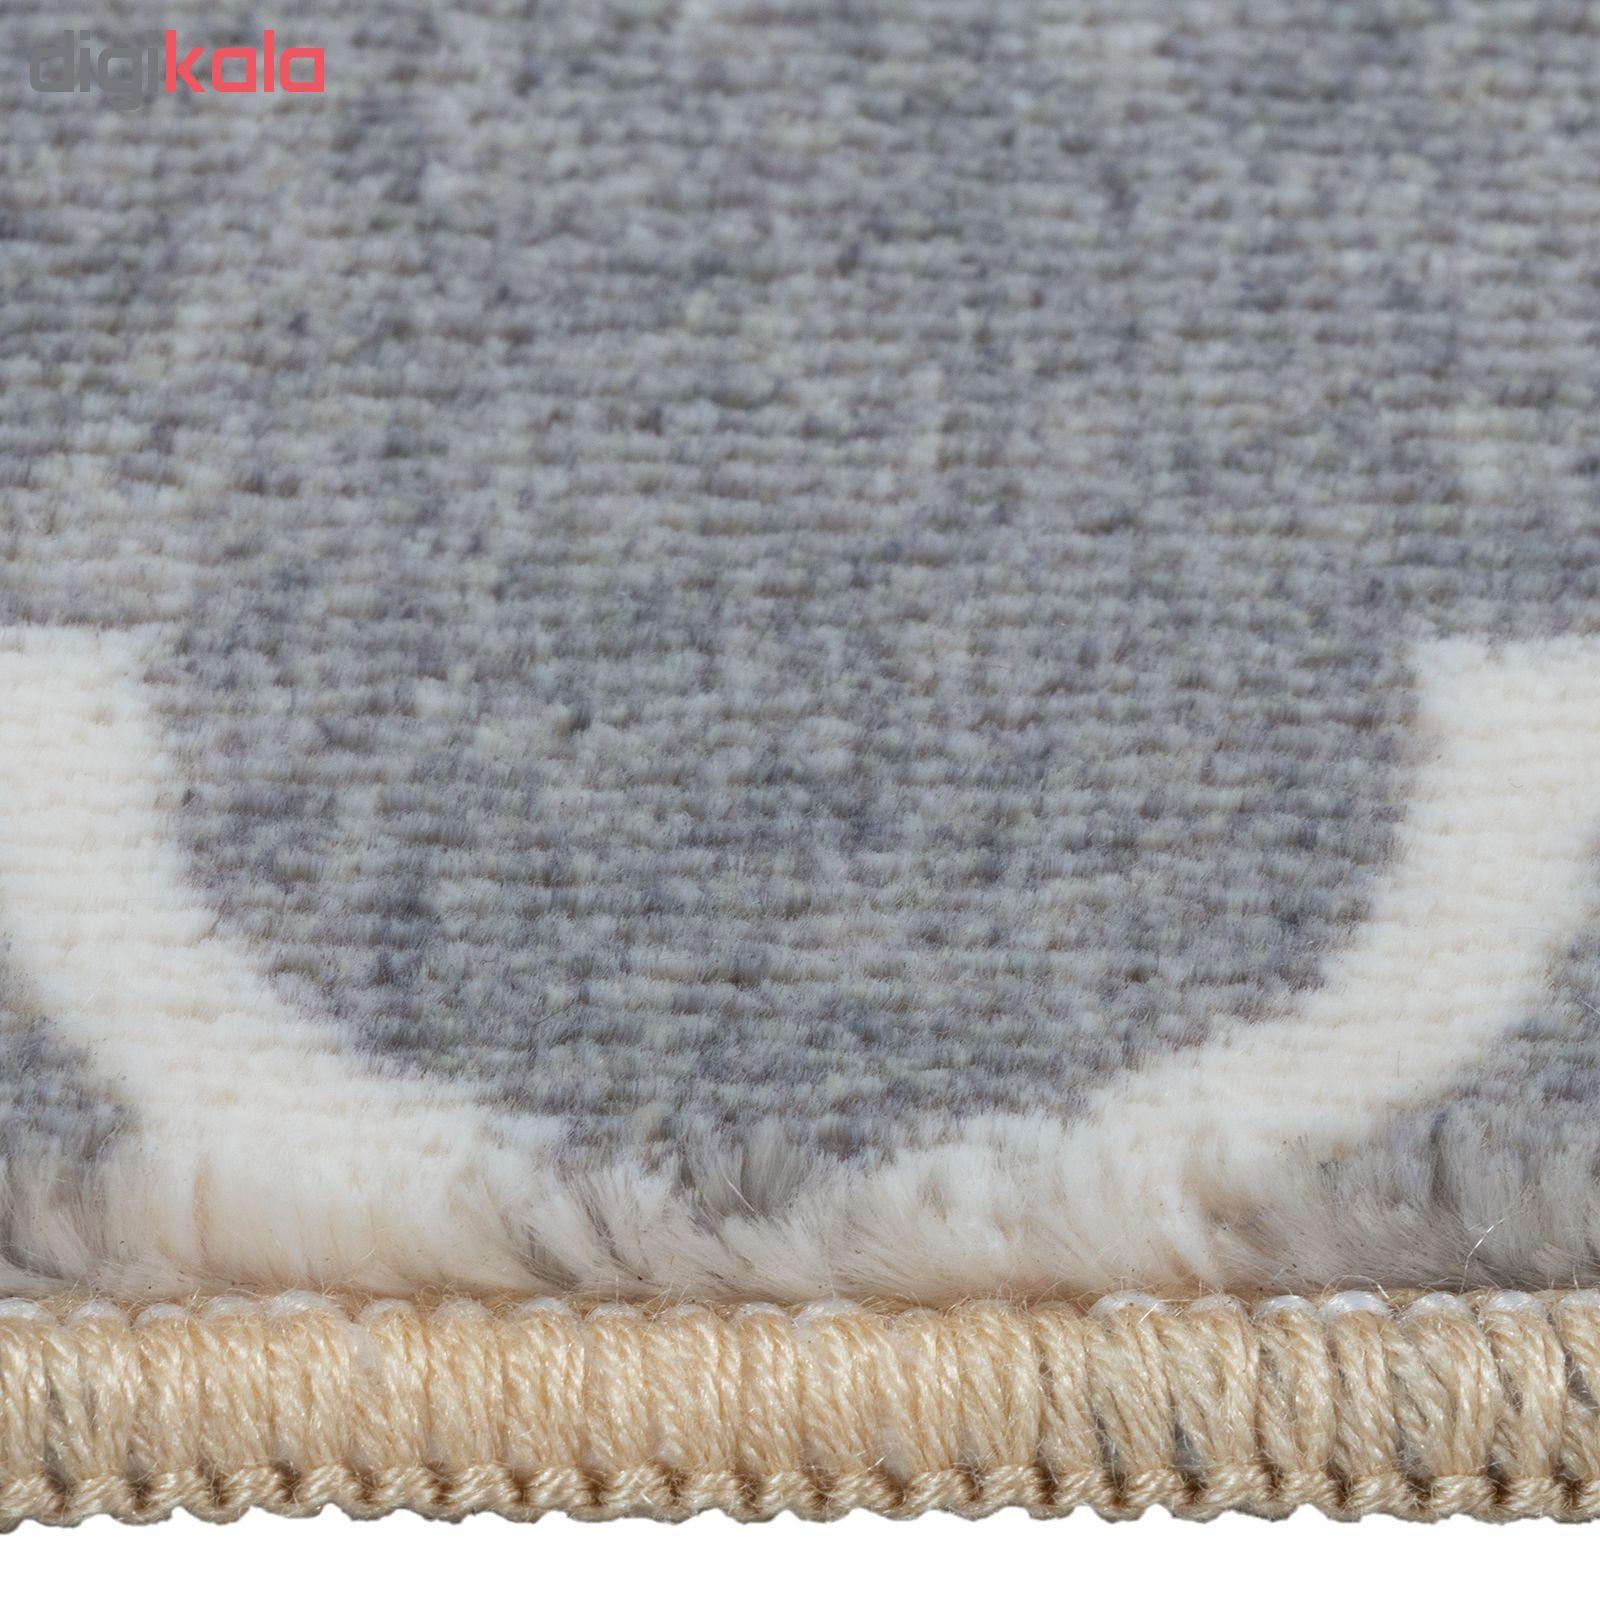 فرش ماشینی محتشم کد 100450 زمینه طوسی main 1 4